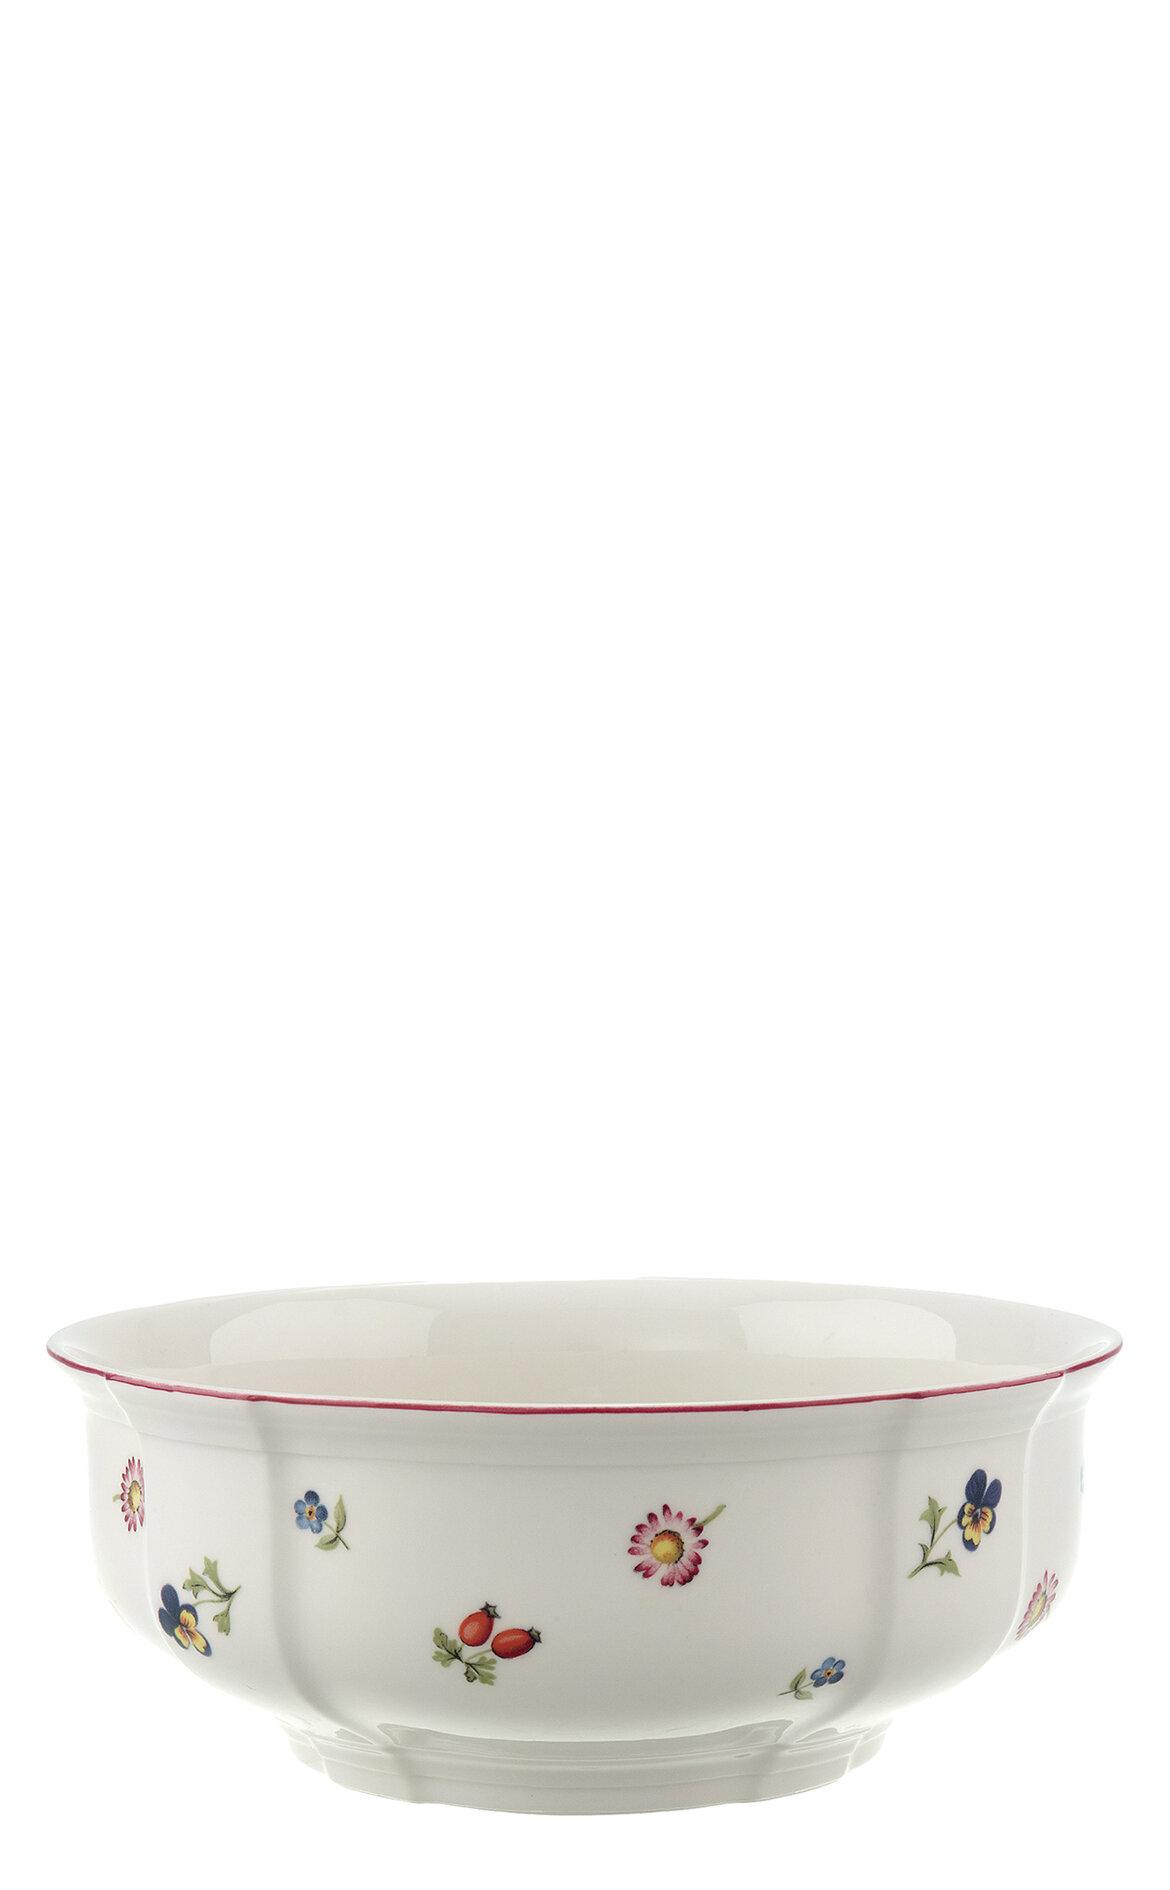 Villeroy & Boch Petite Fleur Salata Servis Kasesi, 21 cm.